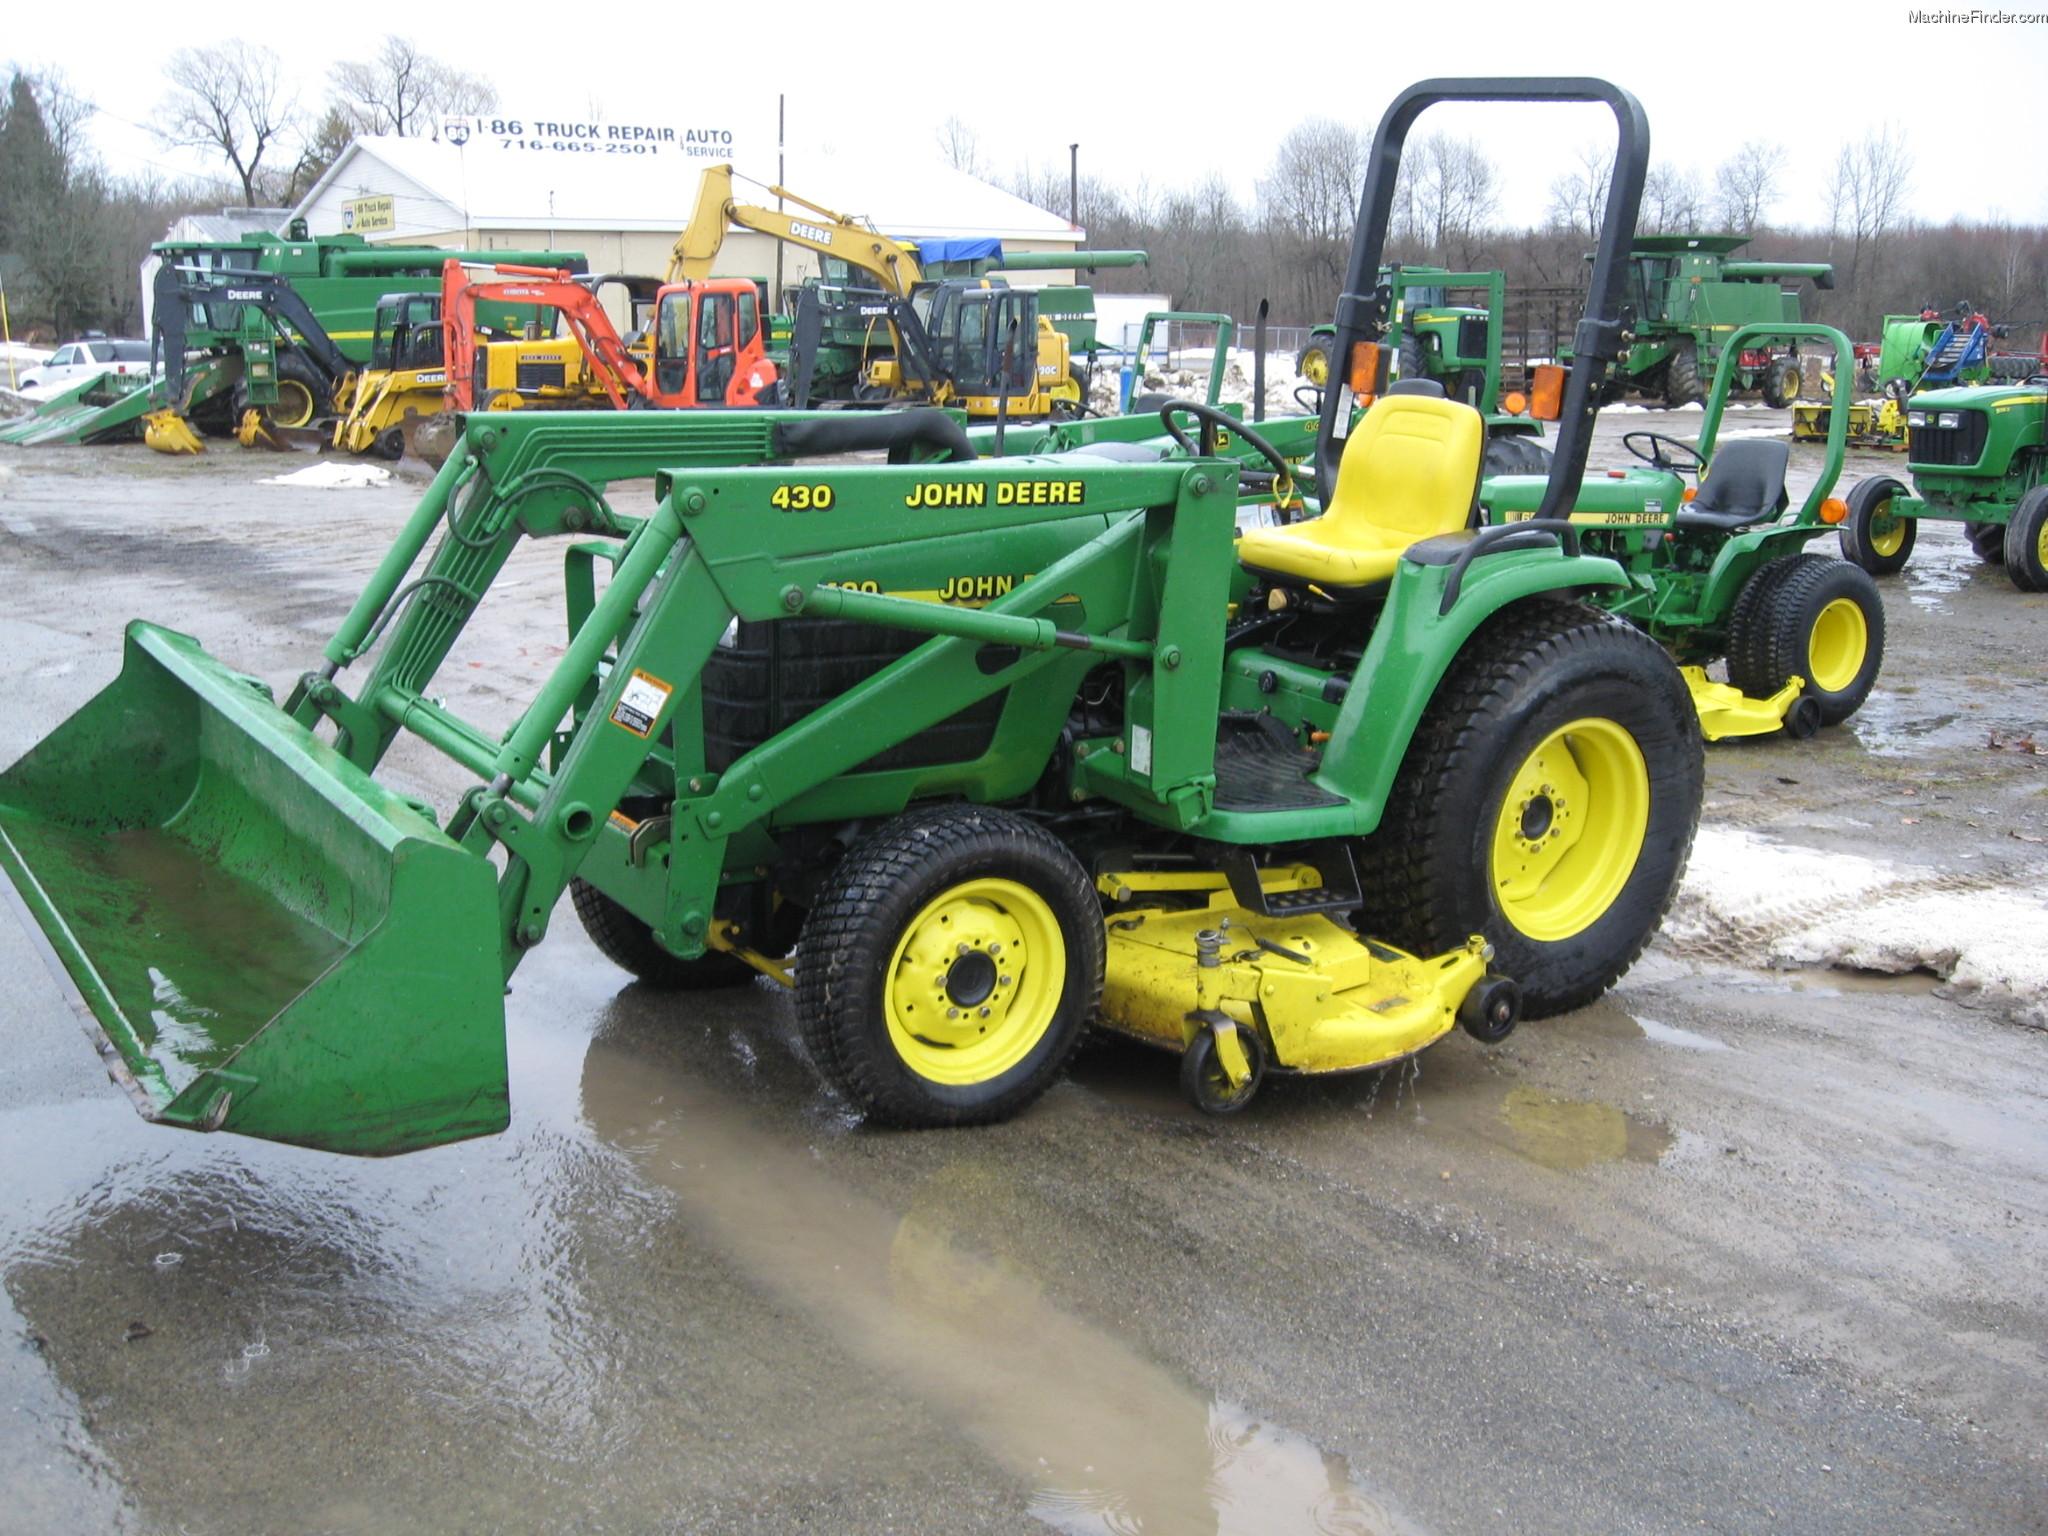 2000 John Deere 4400 Tractors - Compact (1-40hp.) - John ...